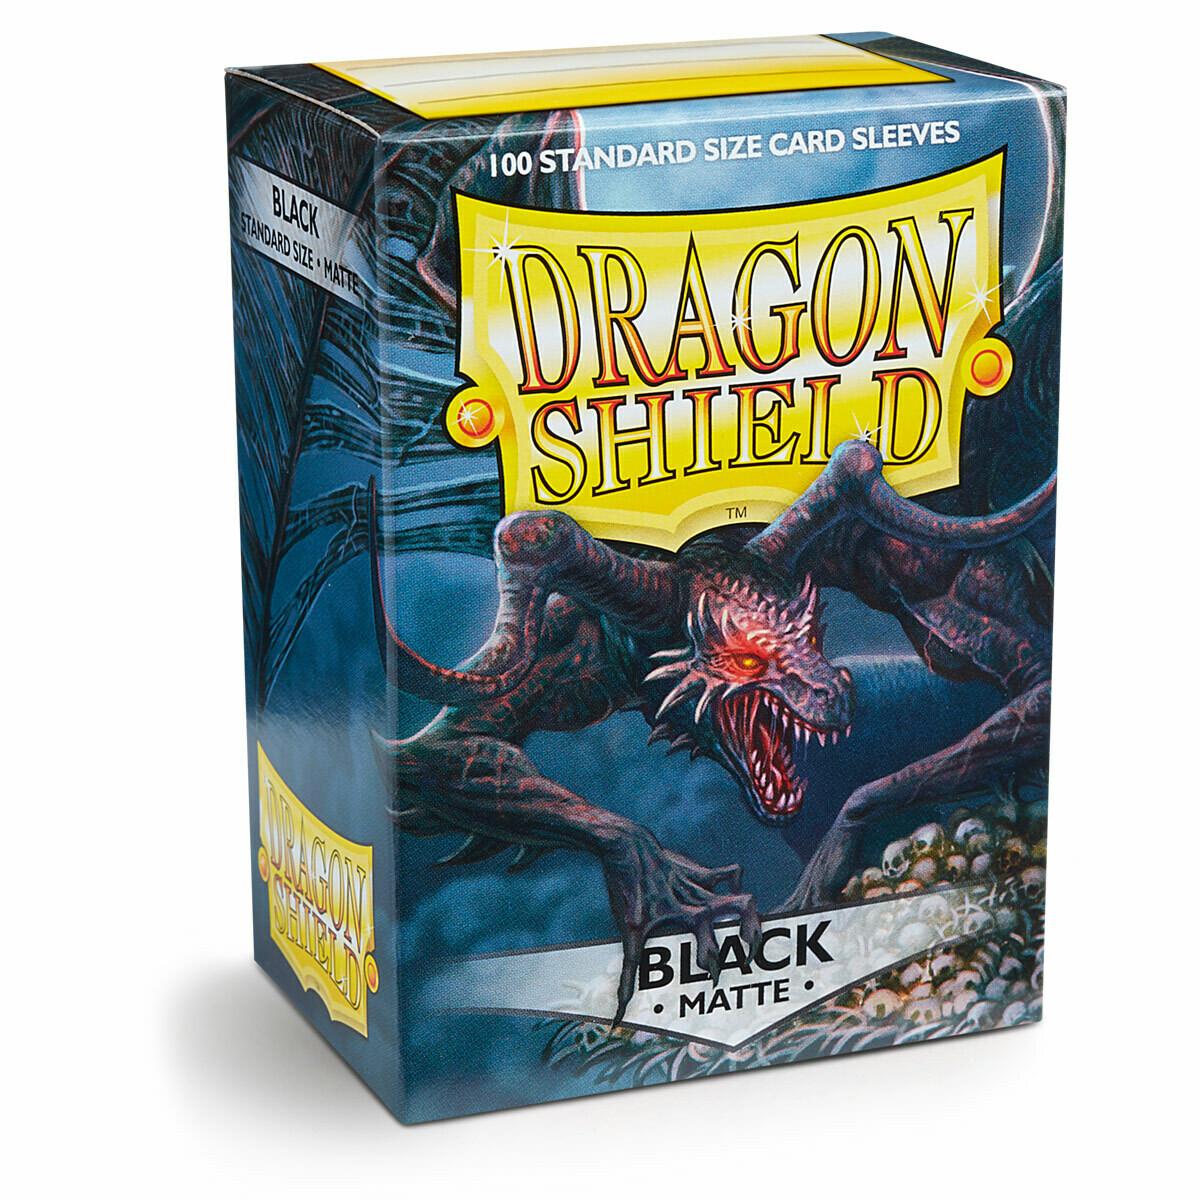 Dragon Shield 100 Sleeves - Matte Black